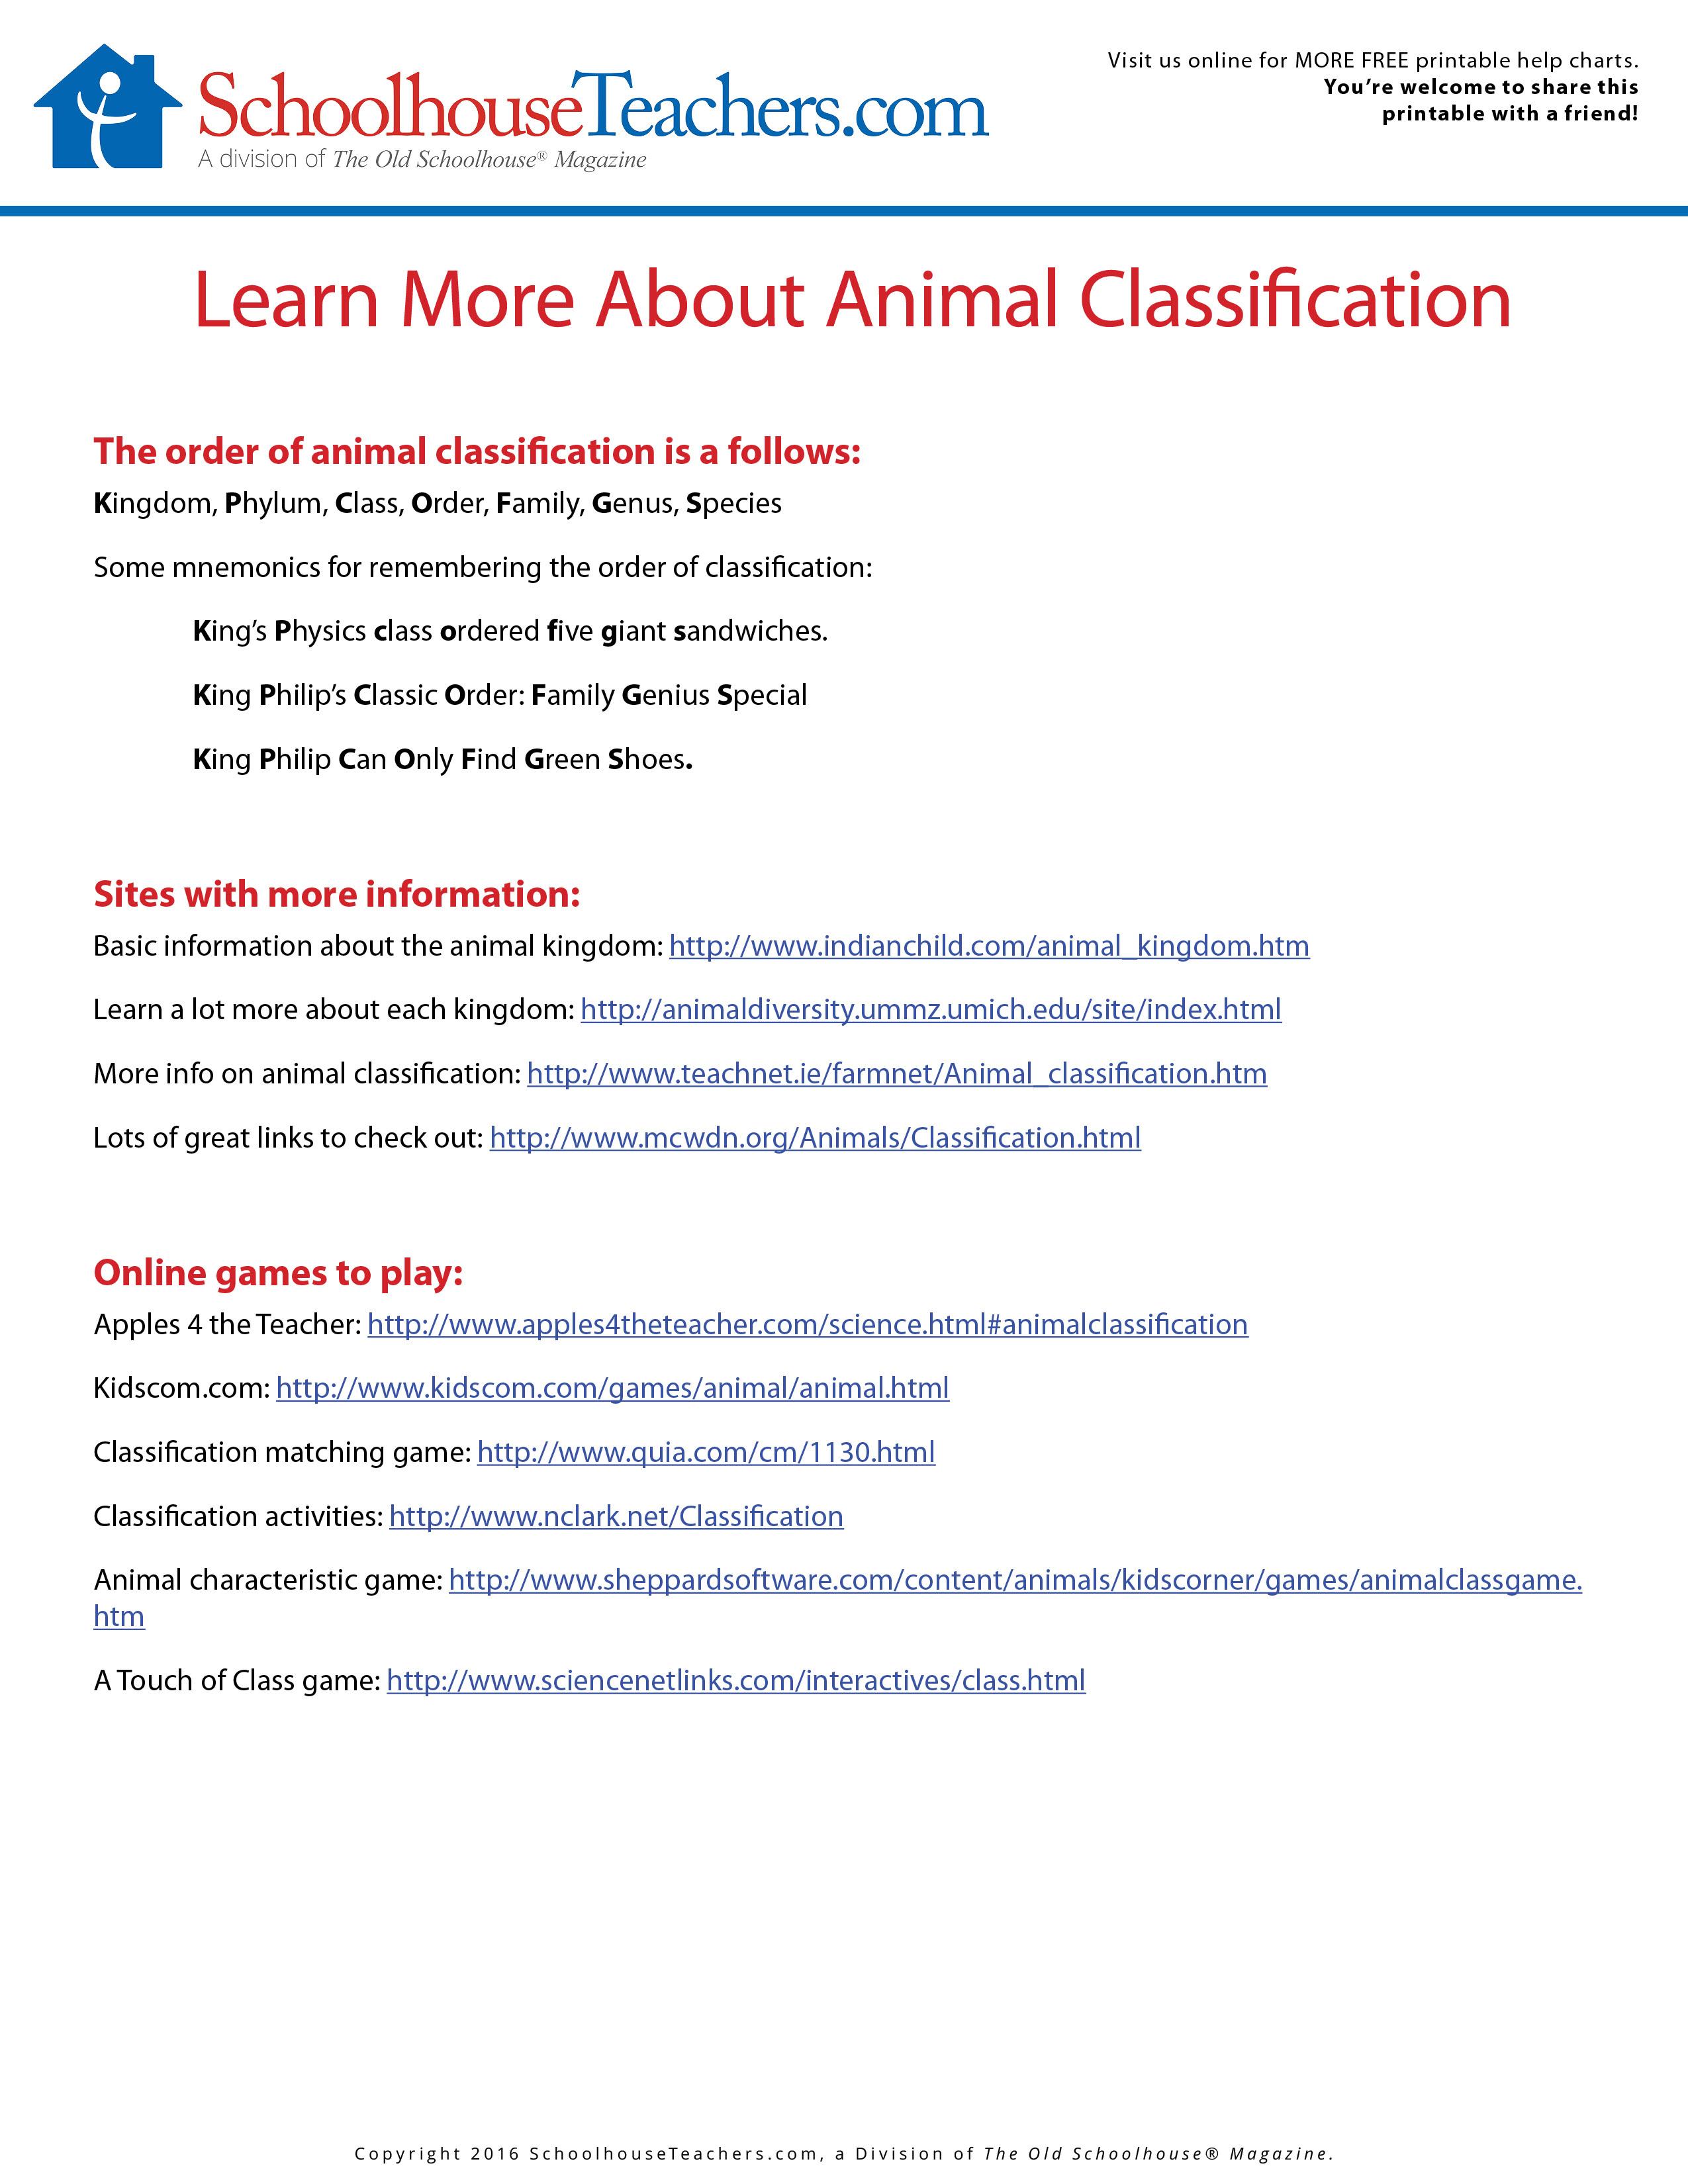 Printable Nature Journal And Animal Classification List